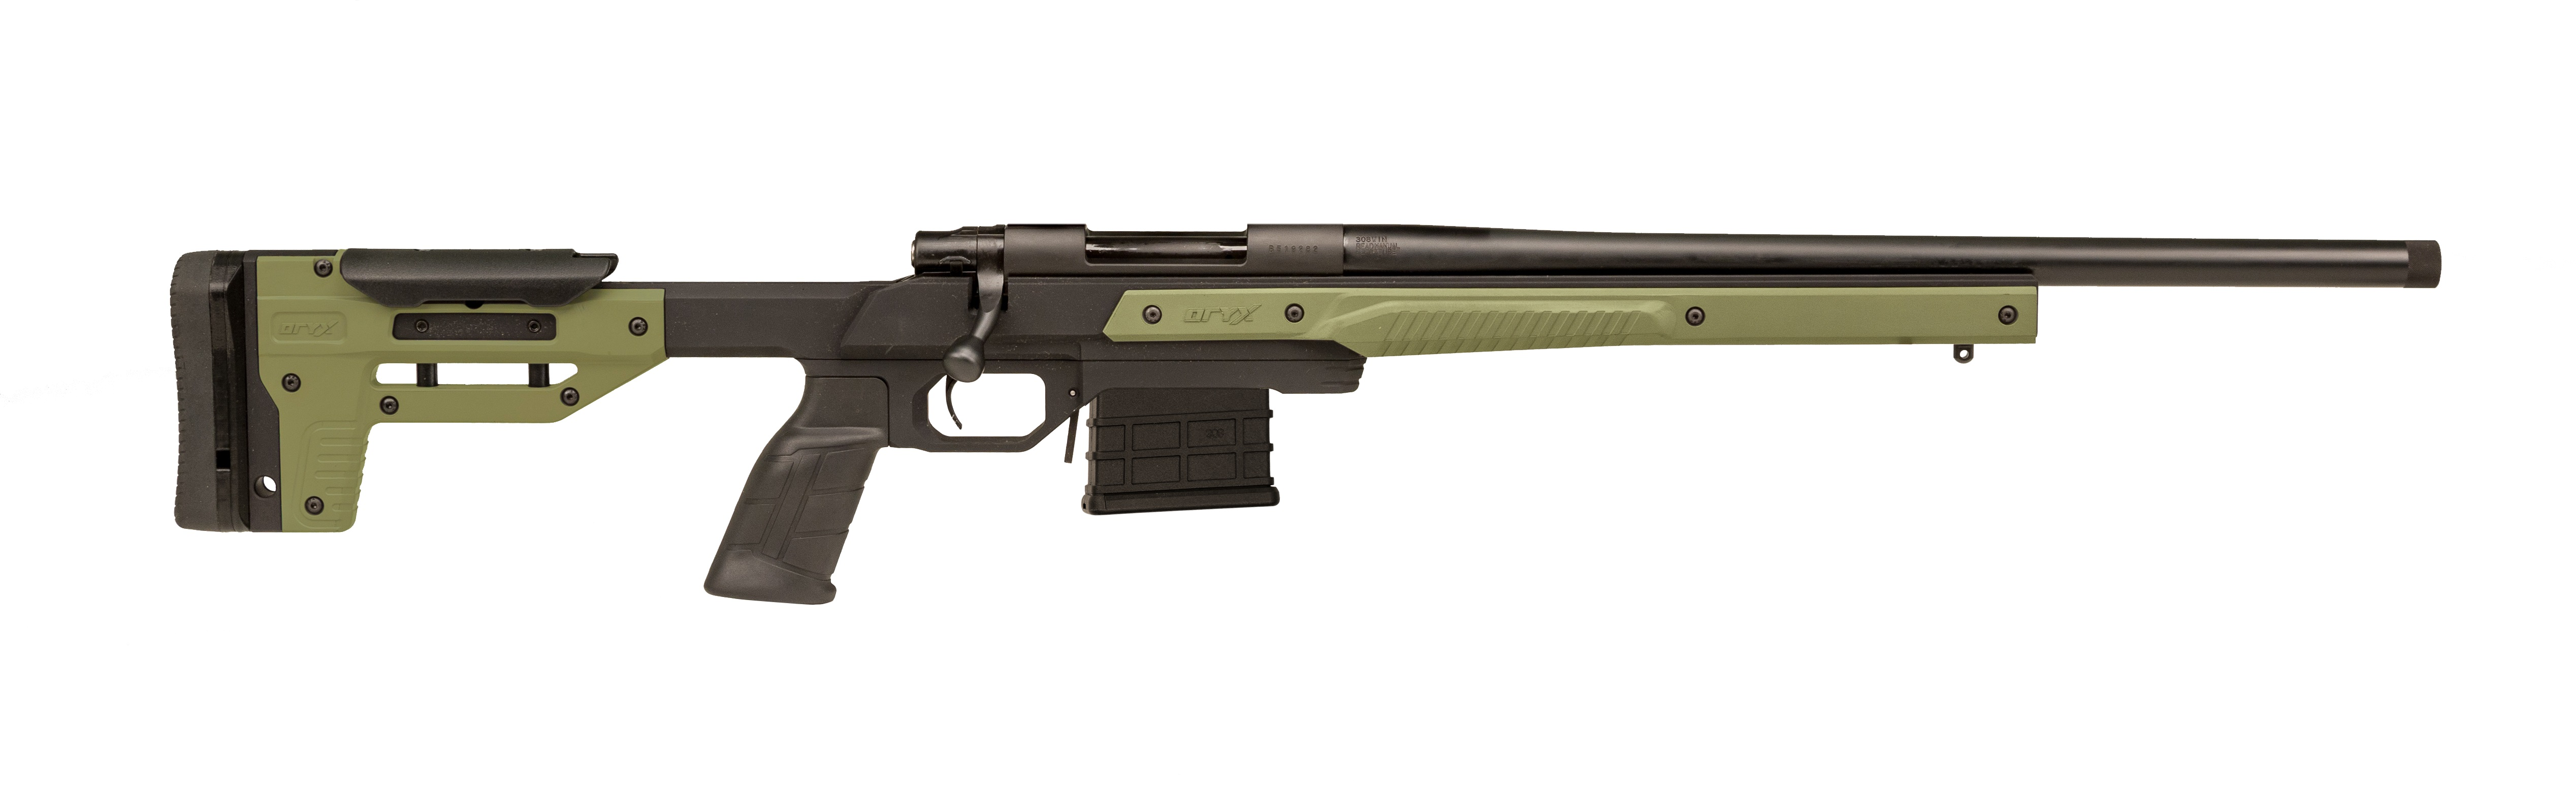 HOWA M1500 Mini Action ORYX 300 AAC Blackout